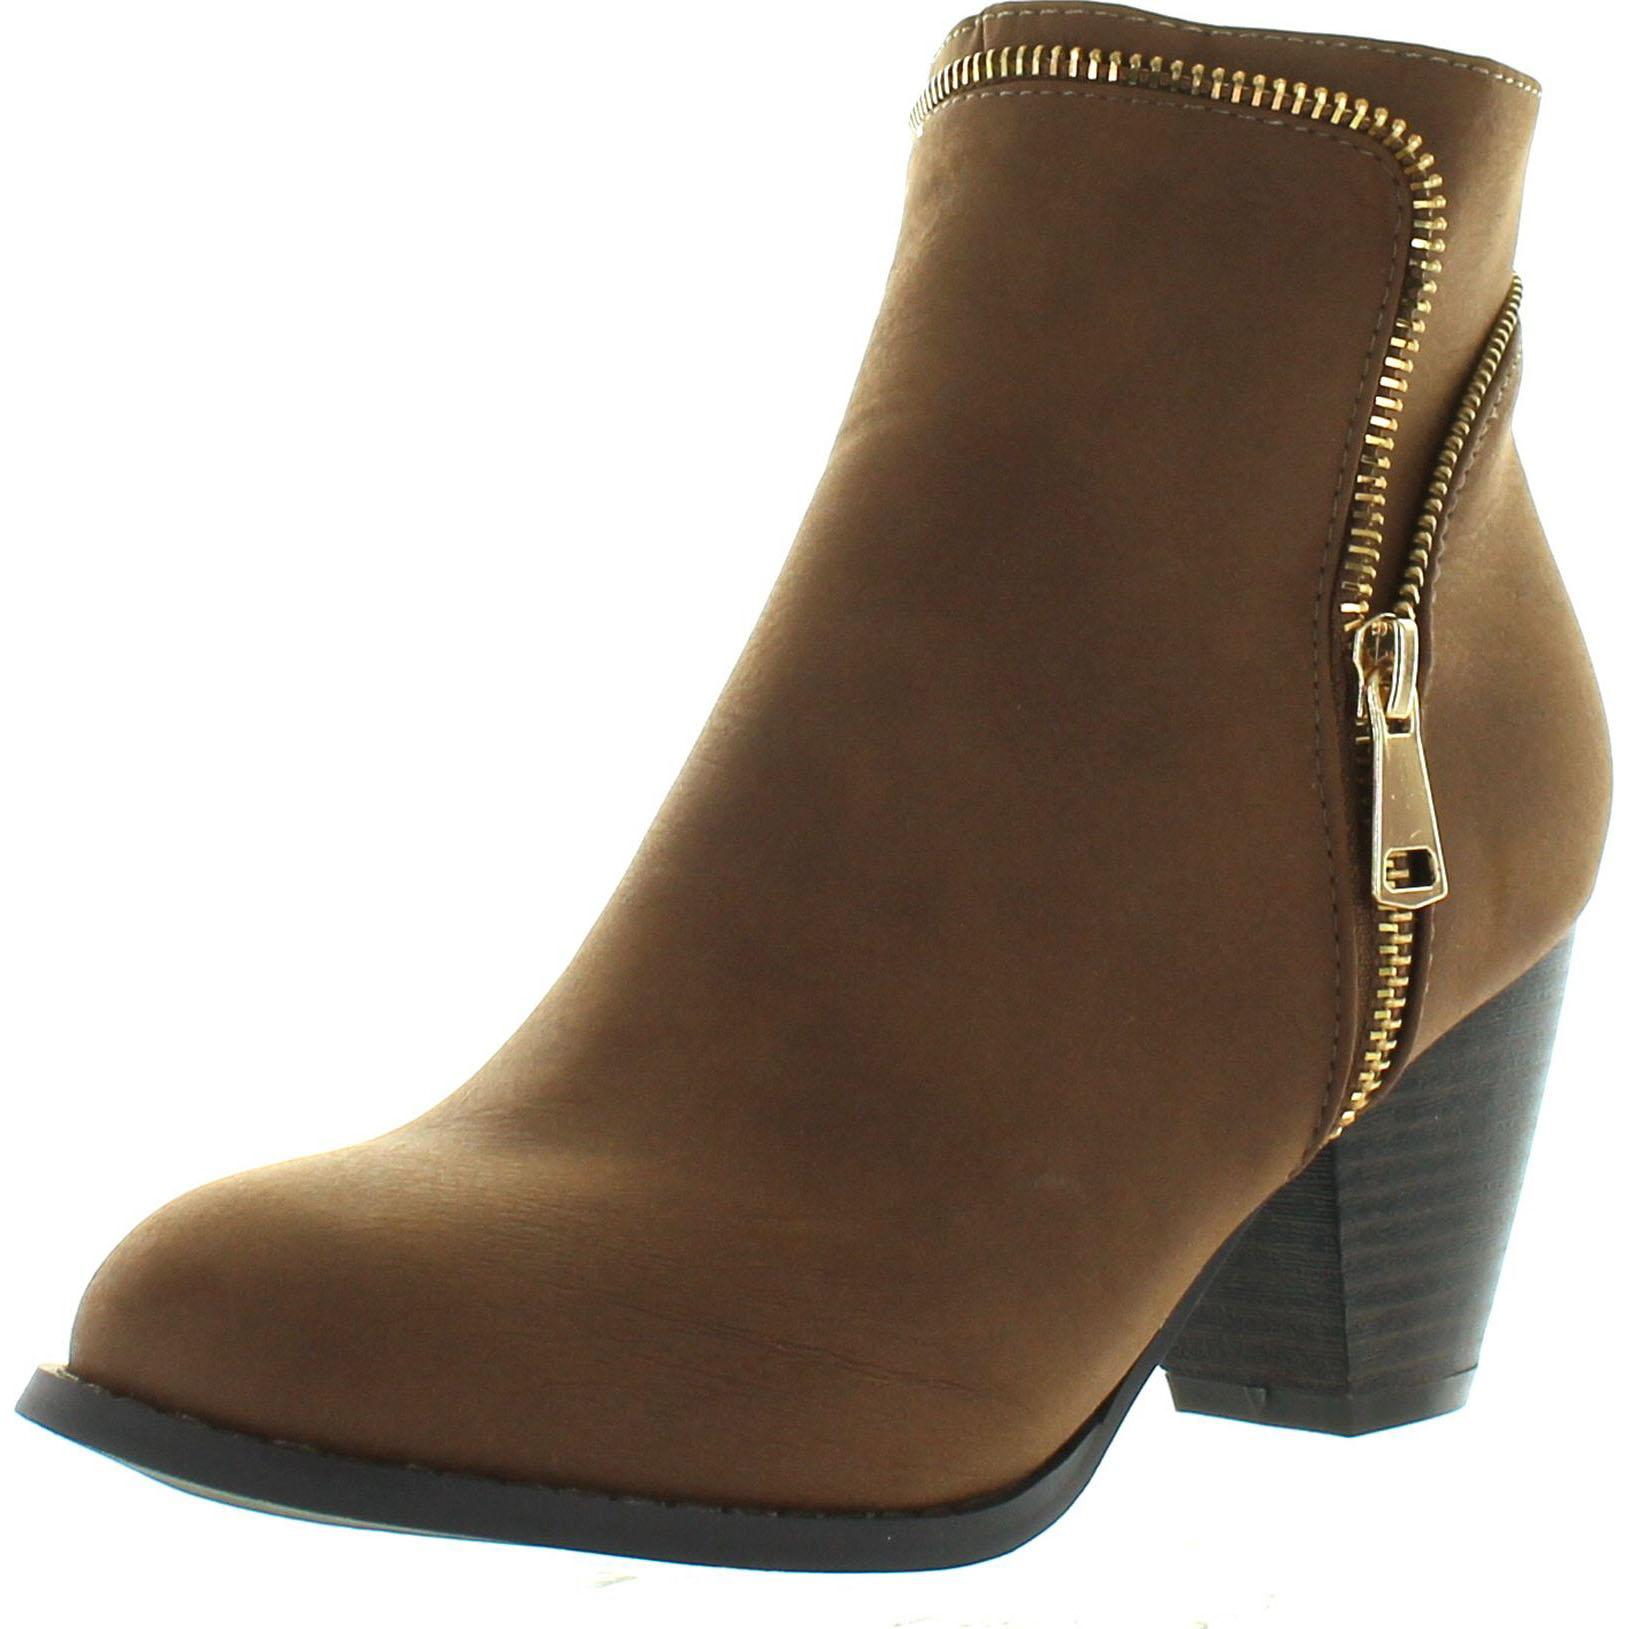 aa8cb19d03bb Top Moda TAIL-4 Women s Zippper Trim Stacked Block Heel Ankle Booties